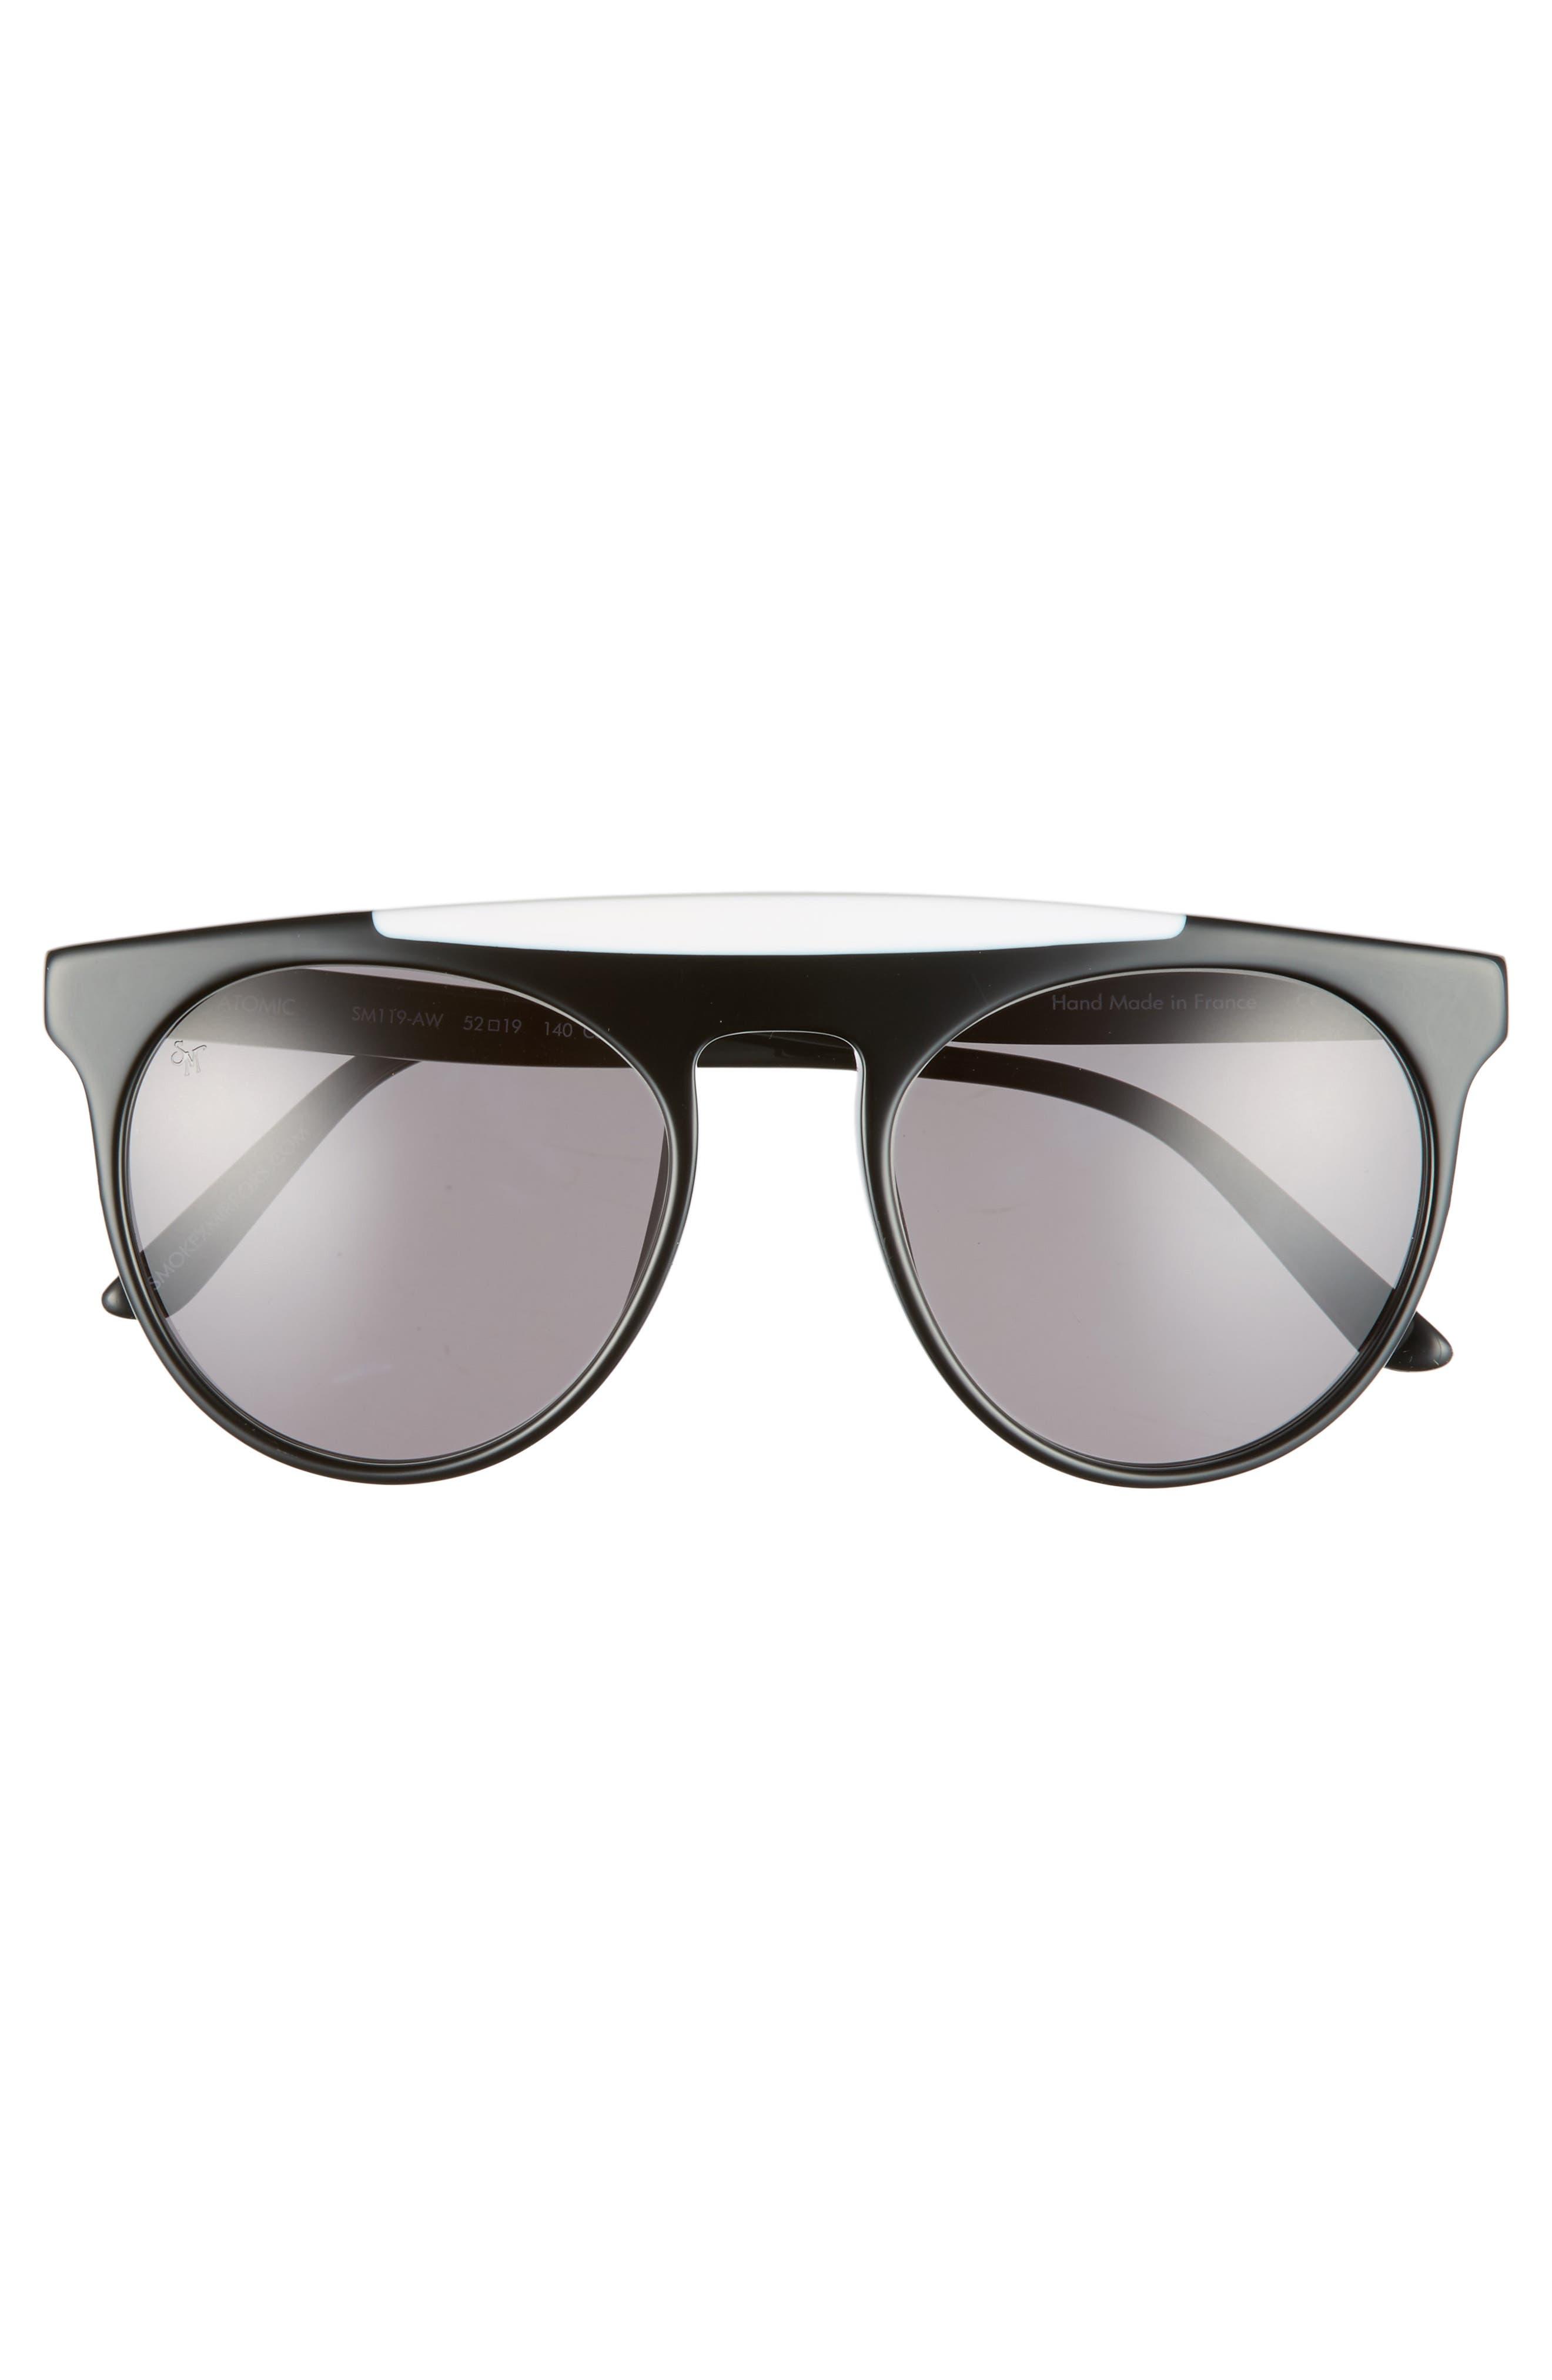 Atomic 52mm Sunglasses,                             Alternate thumbnail 3, color,